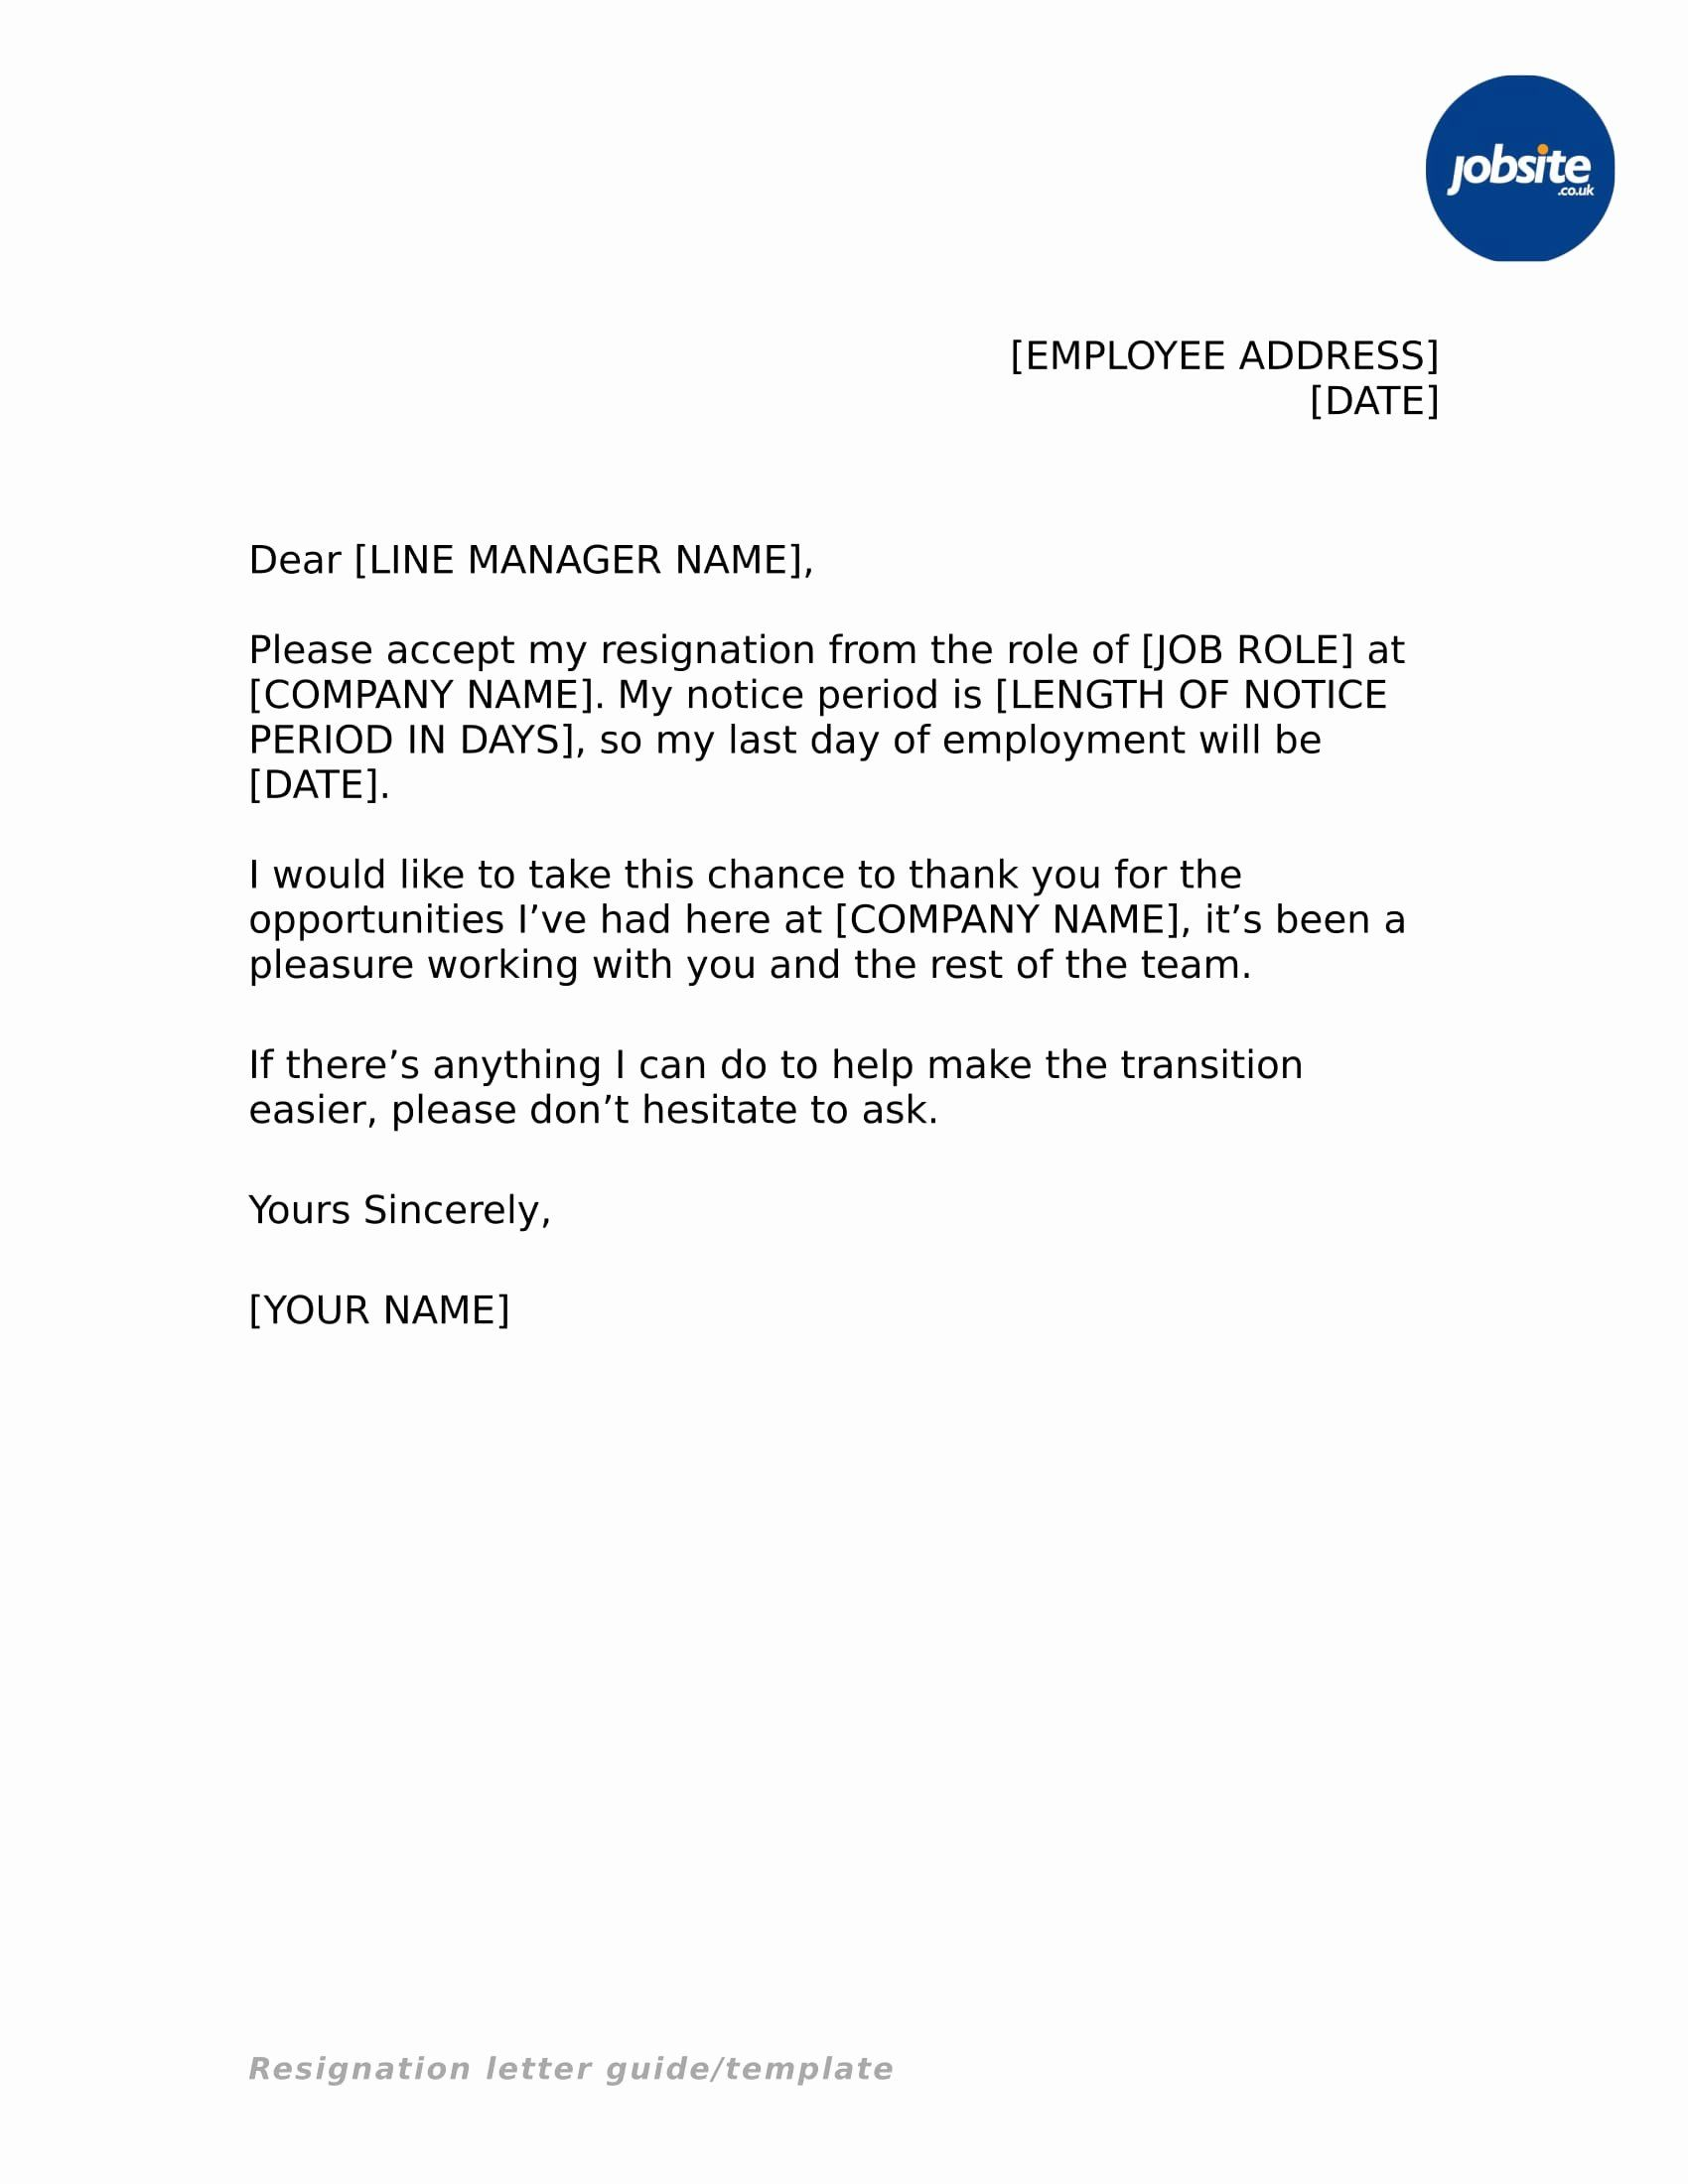 Resignation Letter Formats Pdf from i.pinimg.com